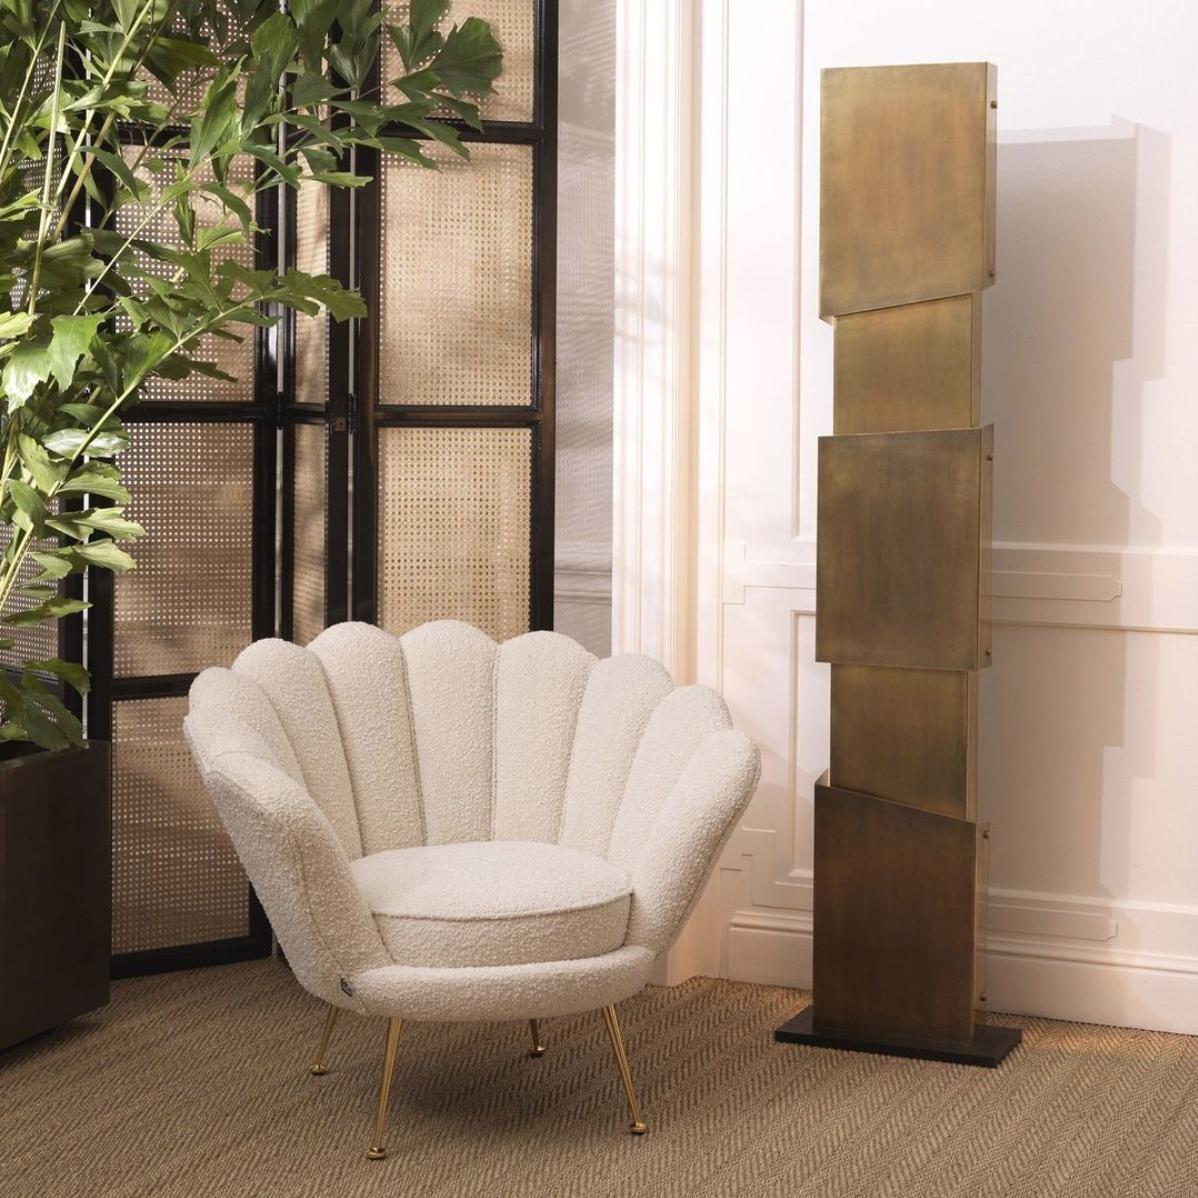 The Trapezium Chair